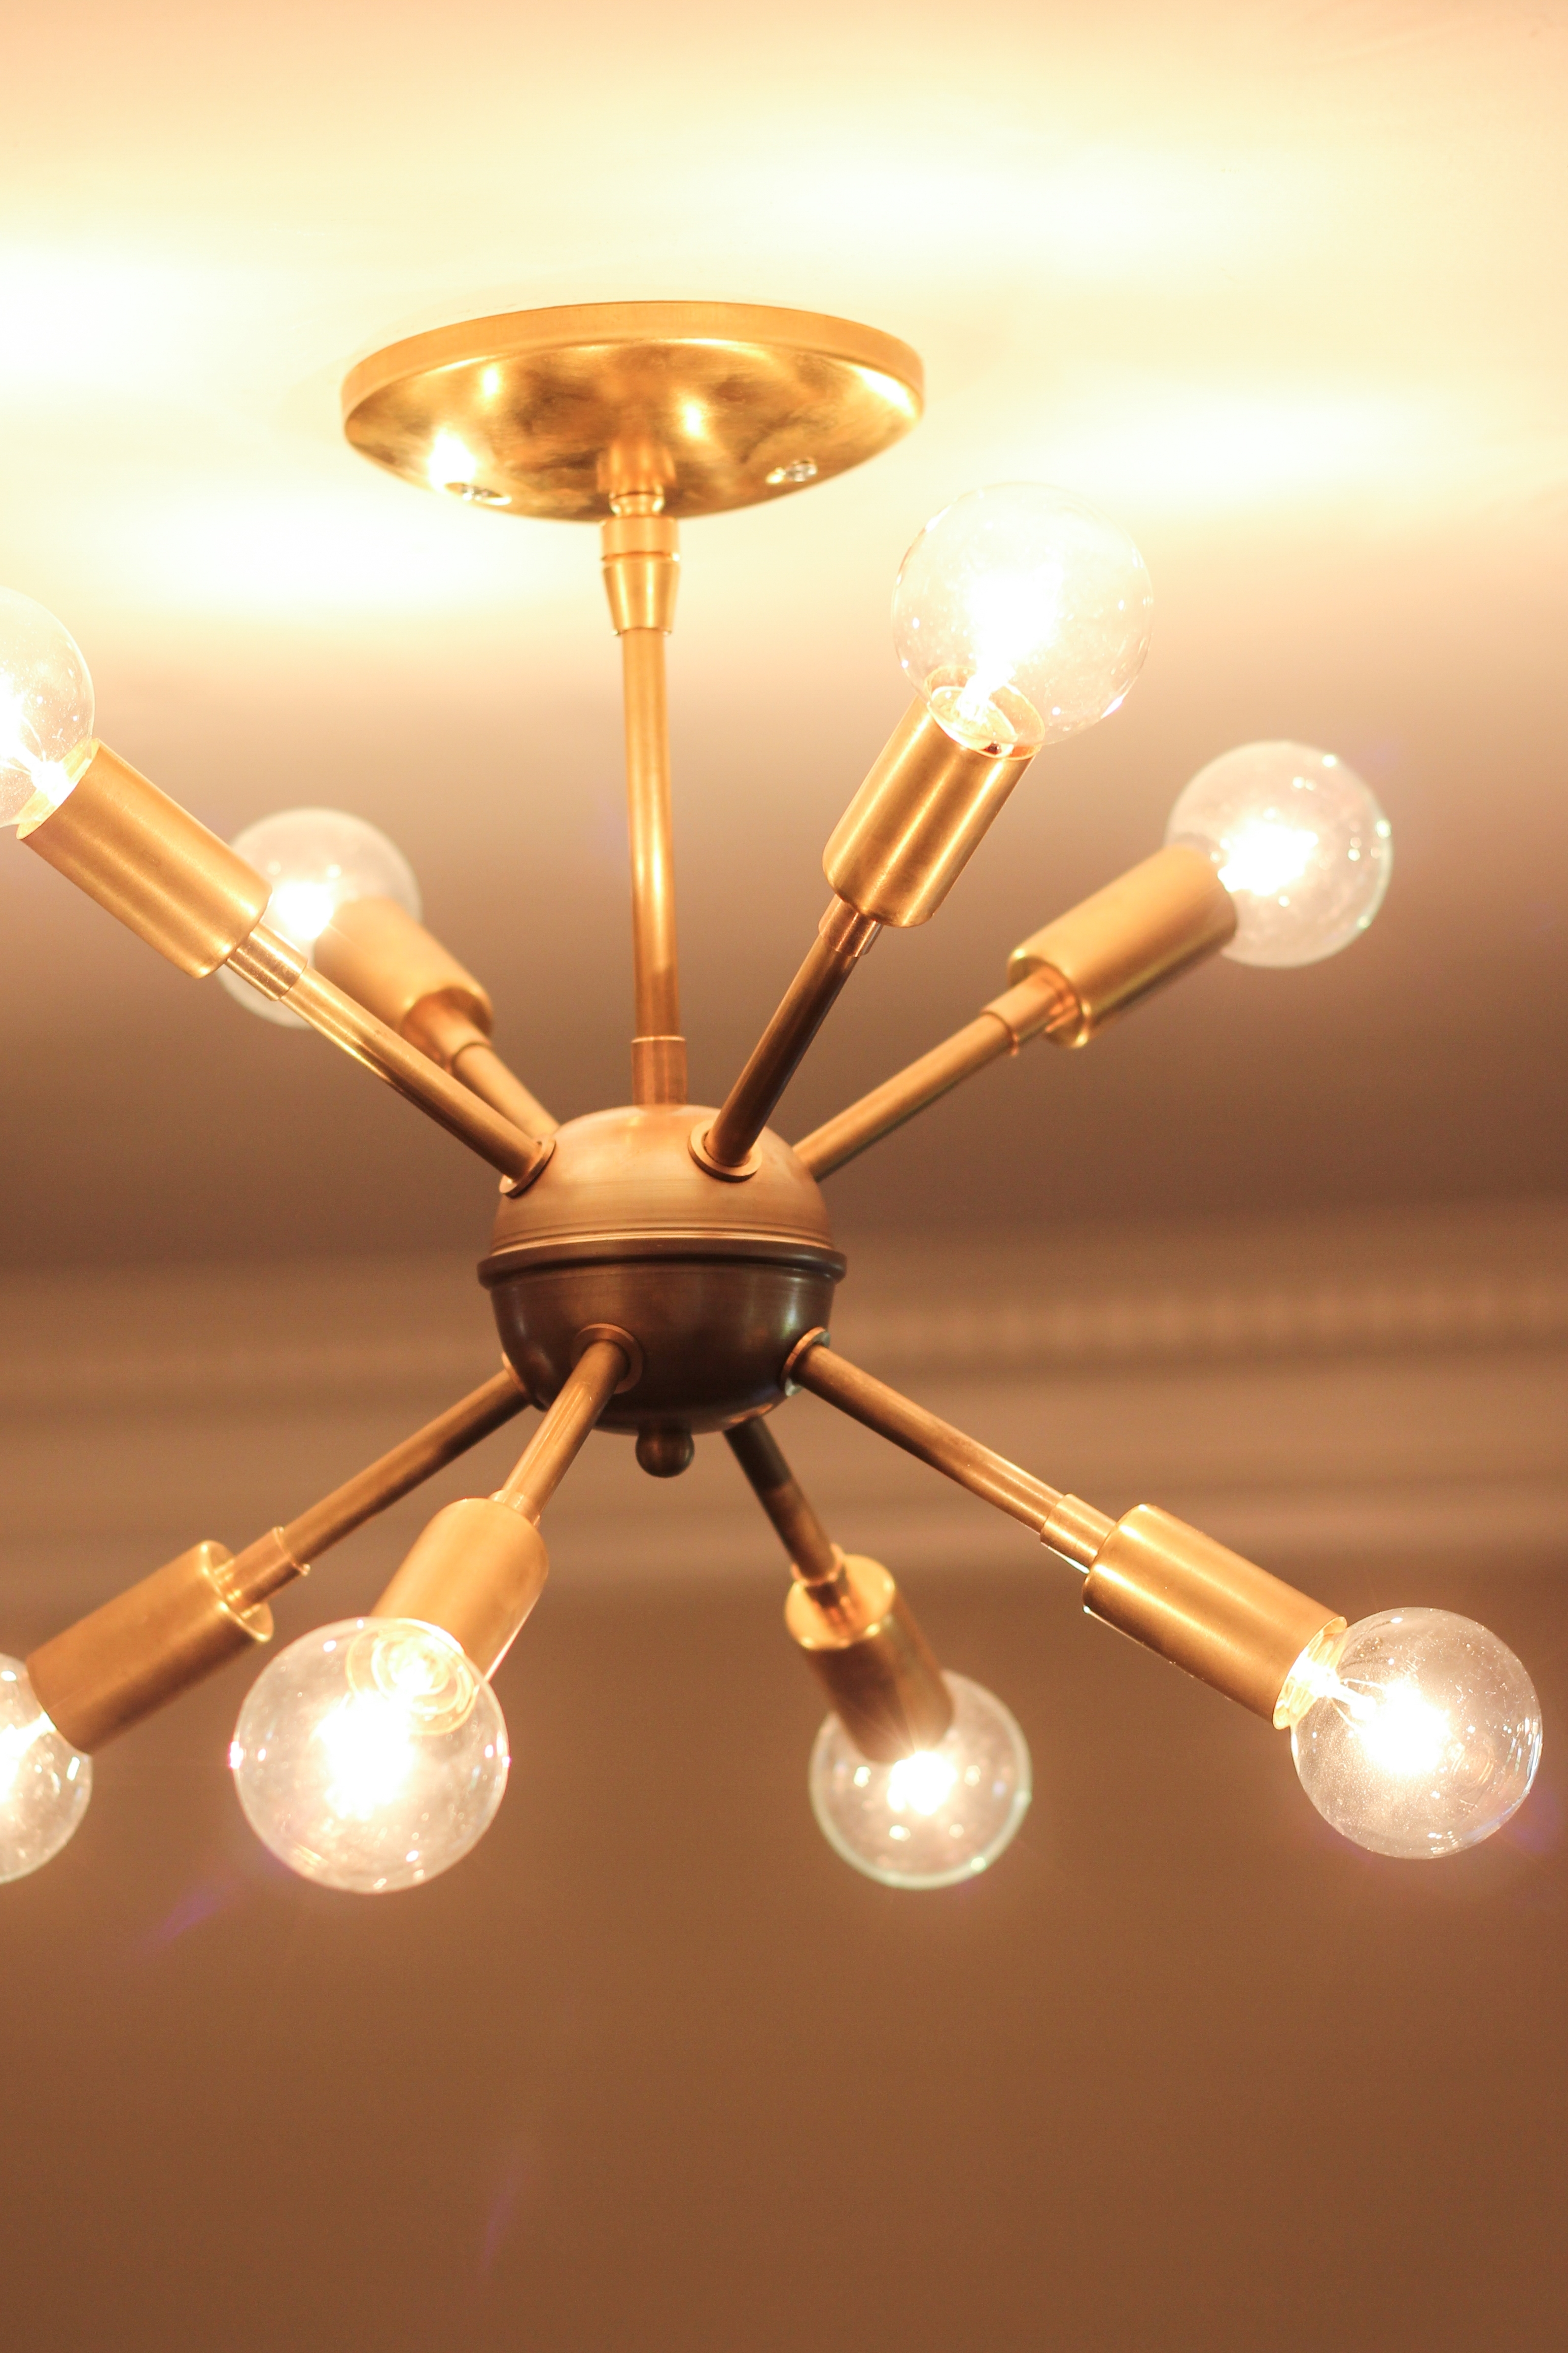 Preferred Mini Sputnik Chandeliers Pertaining To Lighting: Sputnik Chandelier Design With Circular Chandelier And (View 13 of 15)